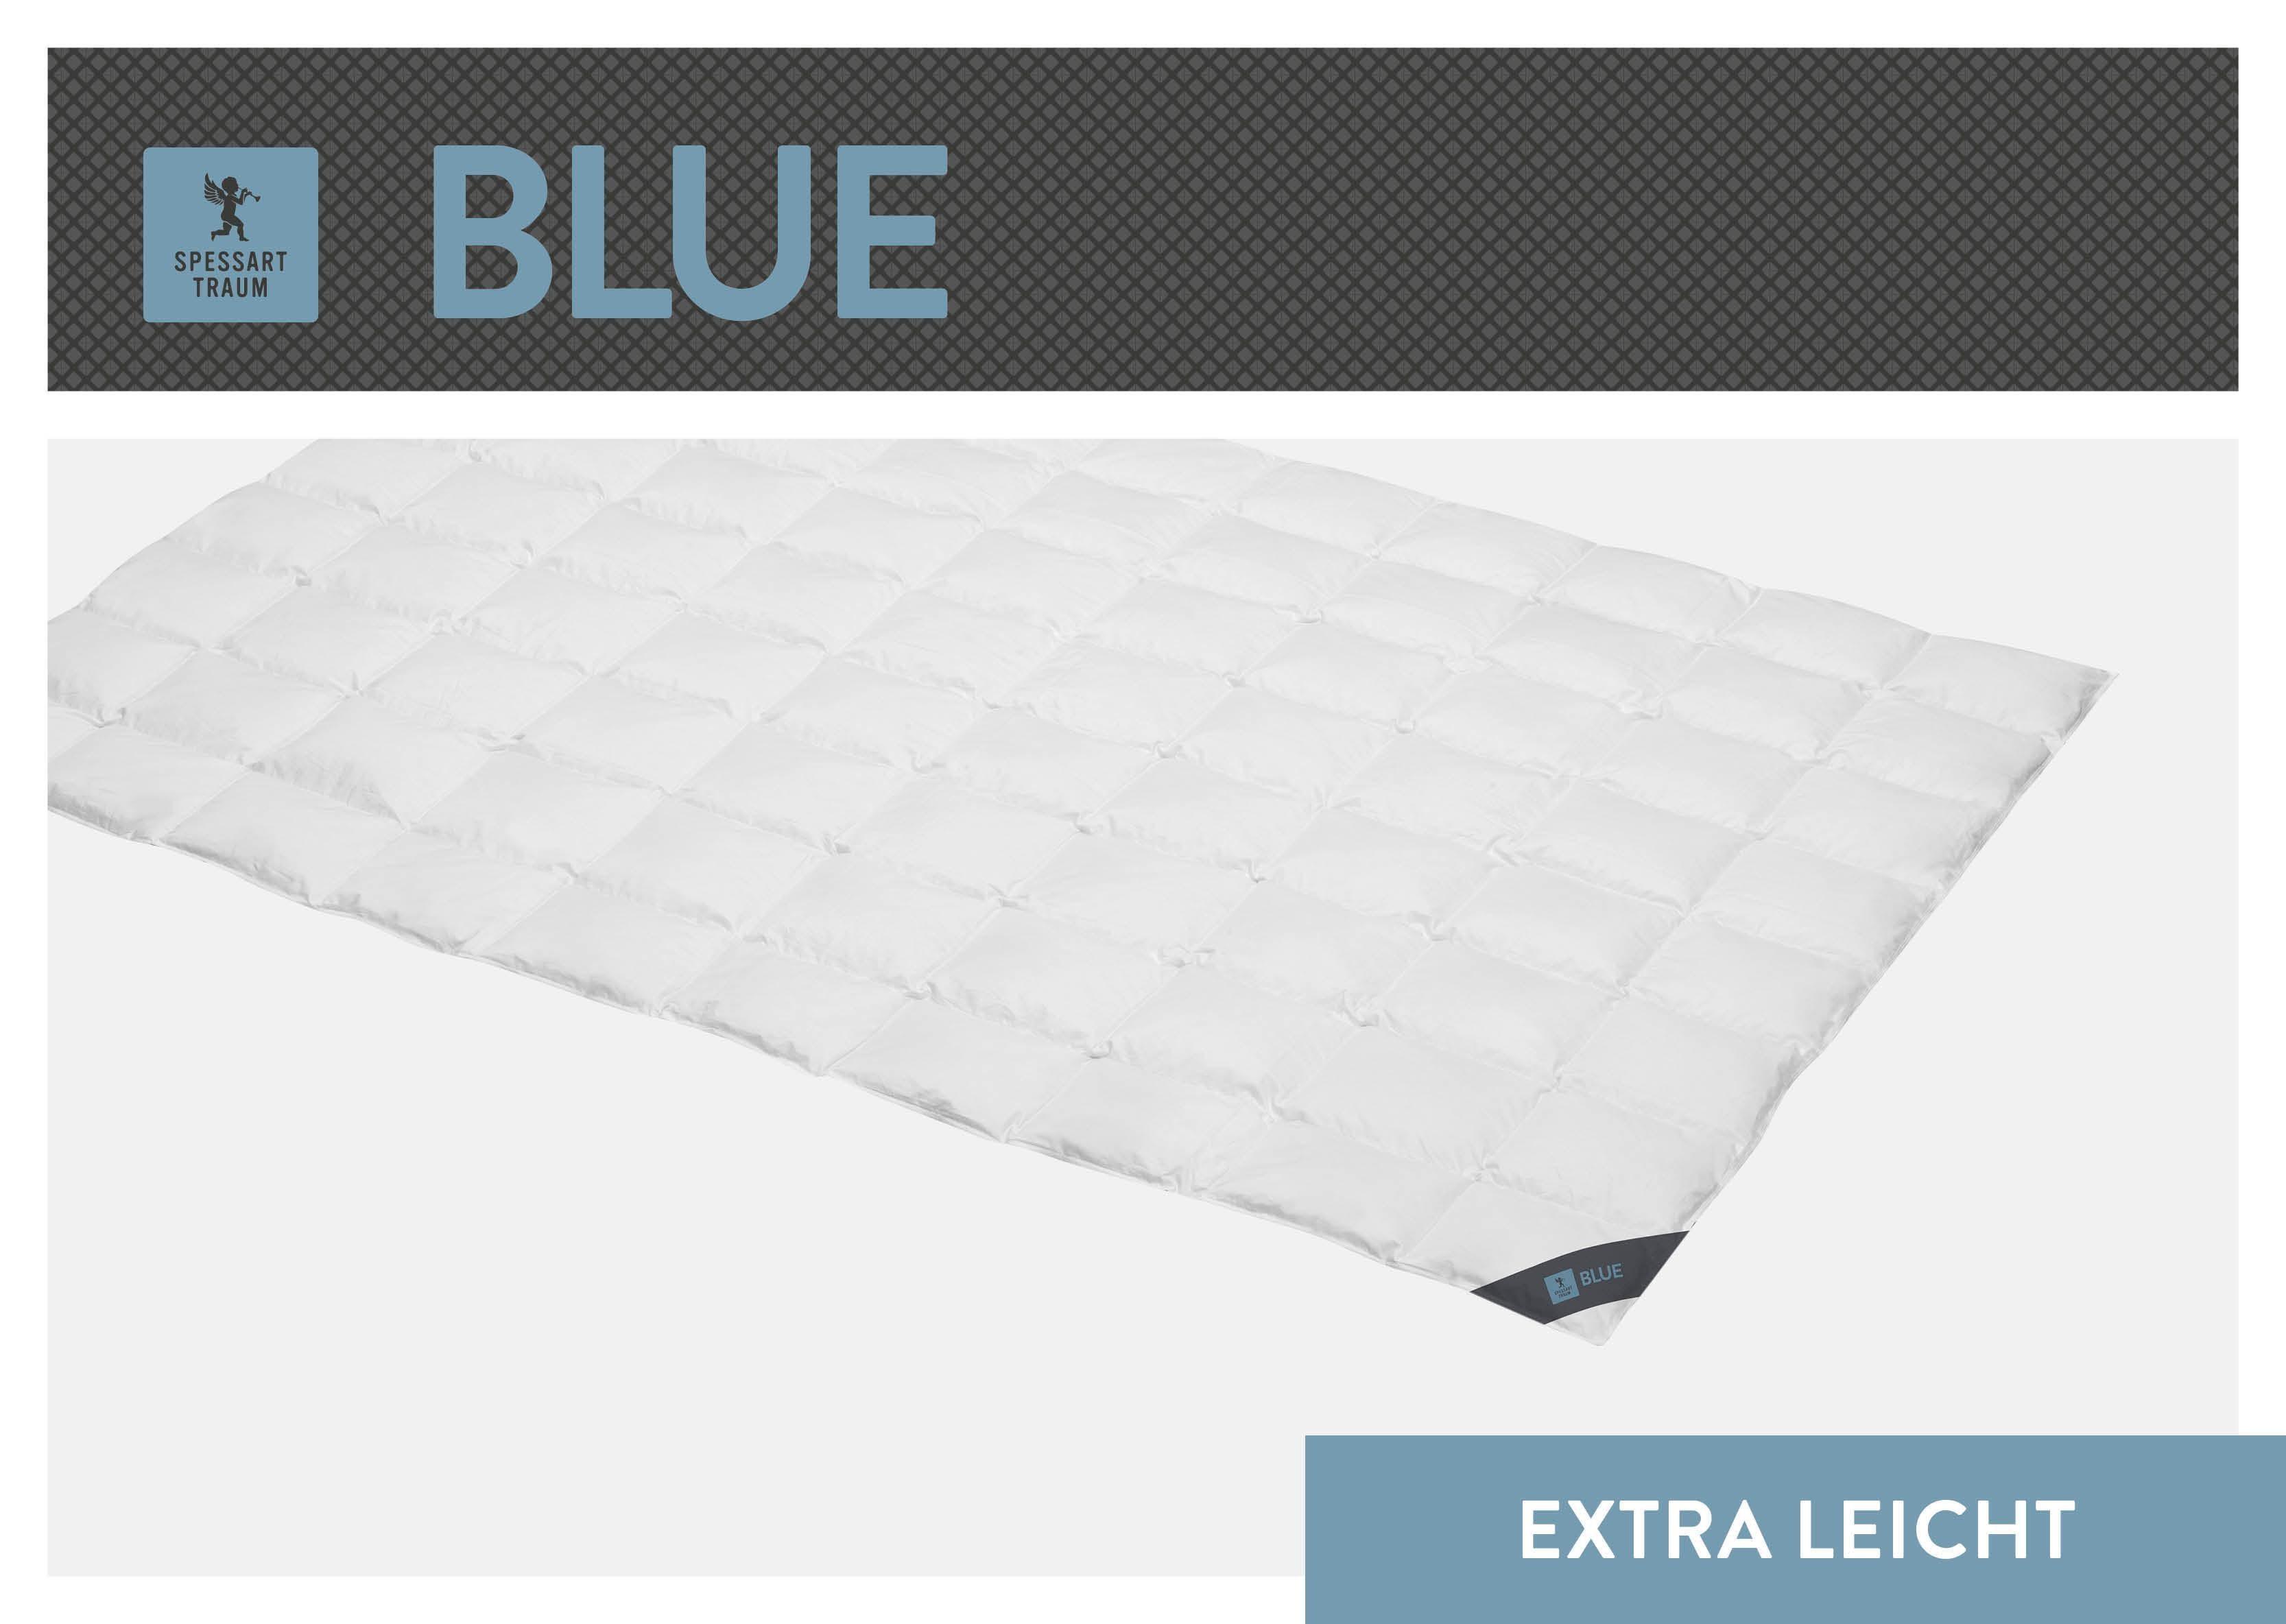 Daunenbettdecke Blue SPESSARTTRAUM extraleicht Füllung: 60% Daunen 40% Federn Bezug: 100% Baumwolle